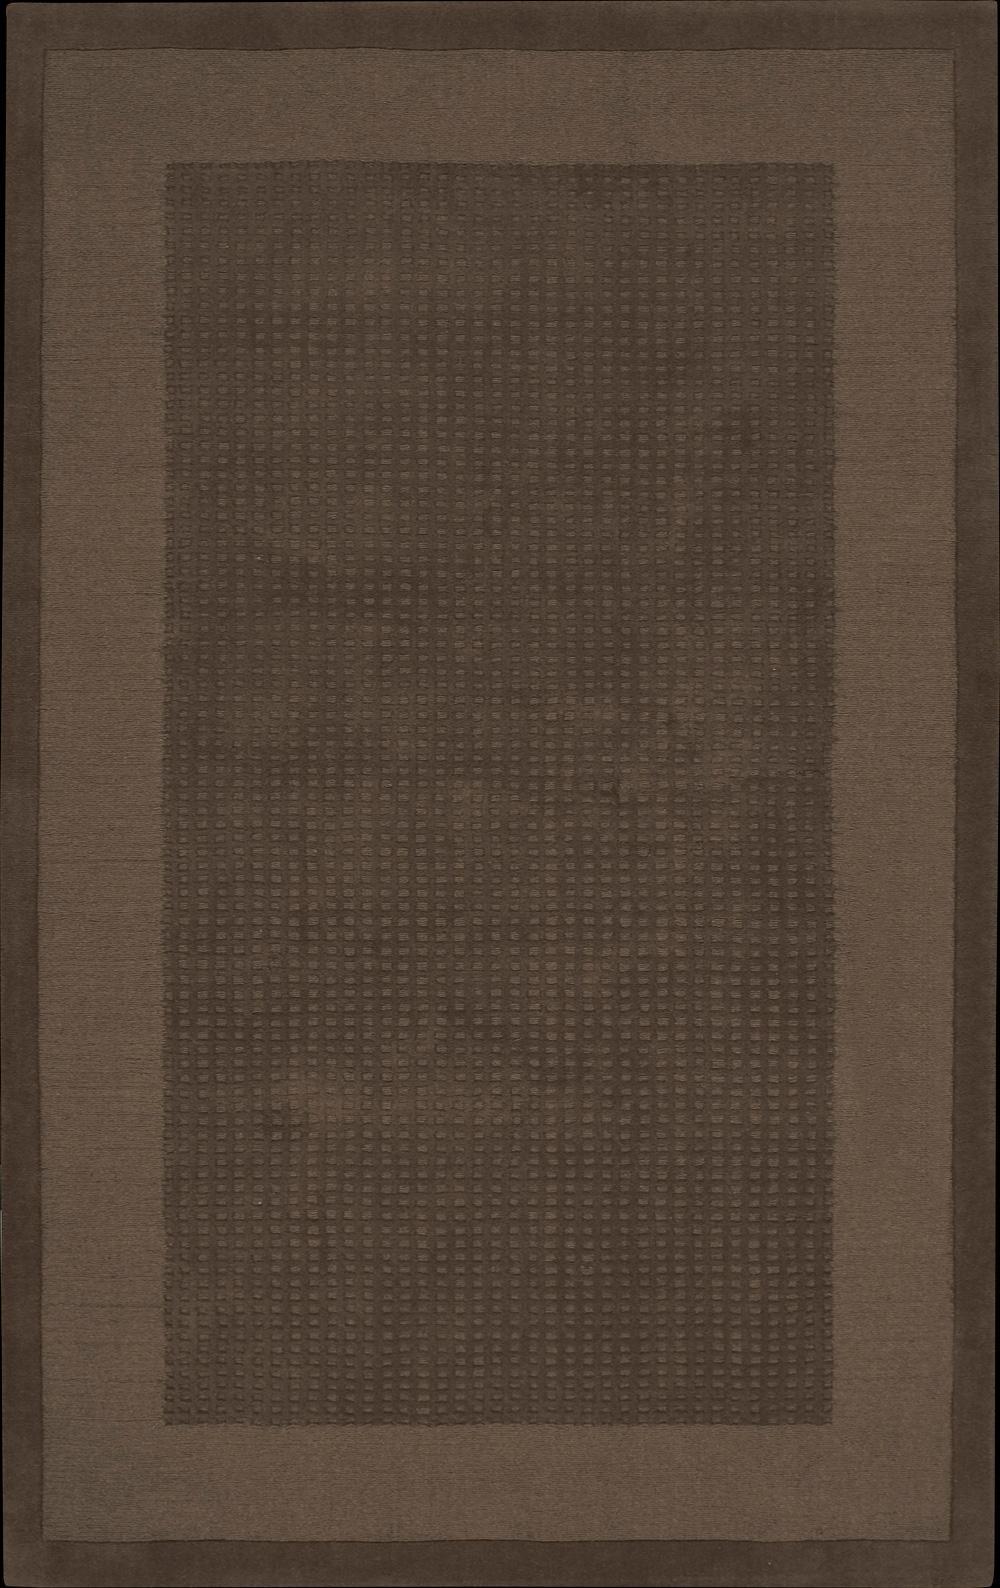 Nourison Westport Area Rug 5' x 8' - Item Number: 72357